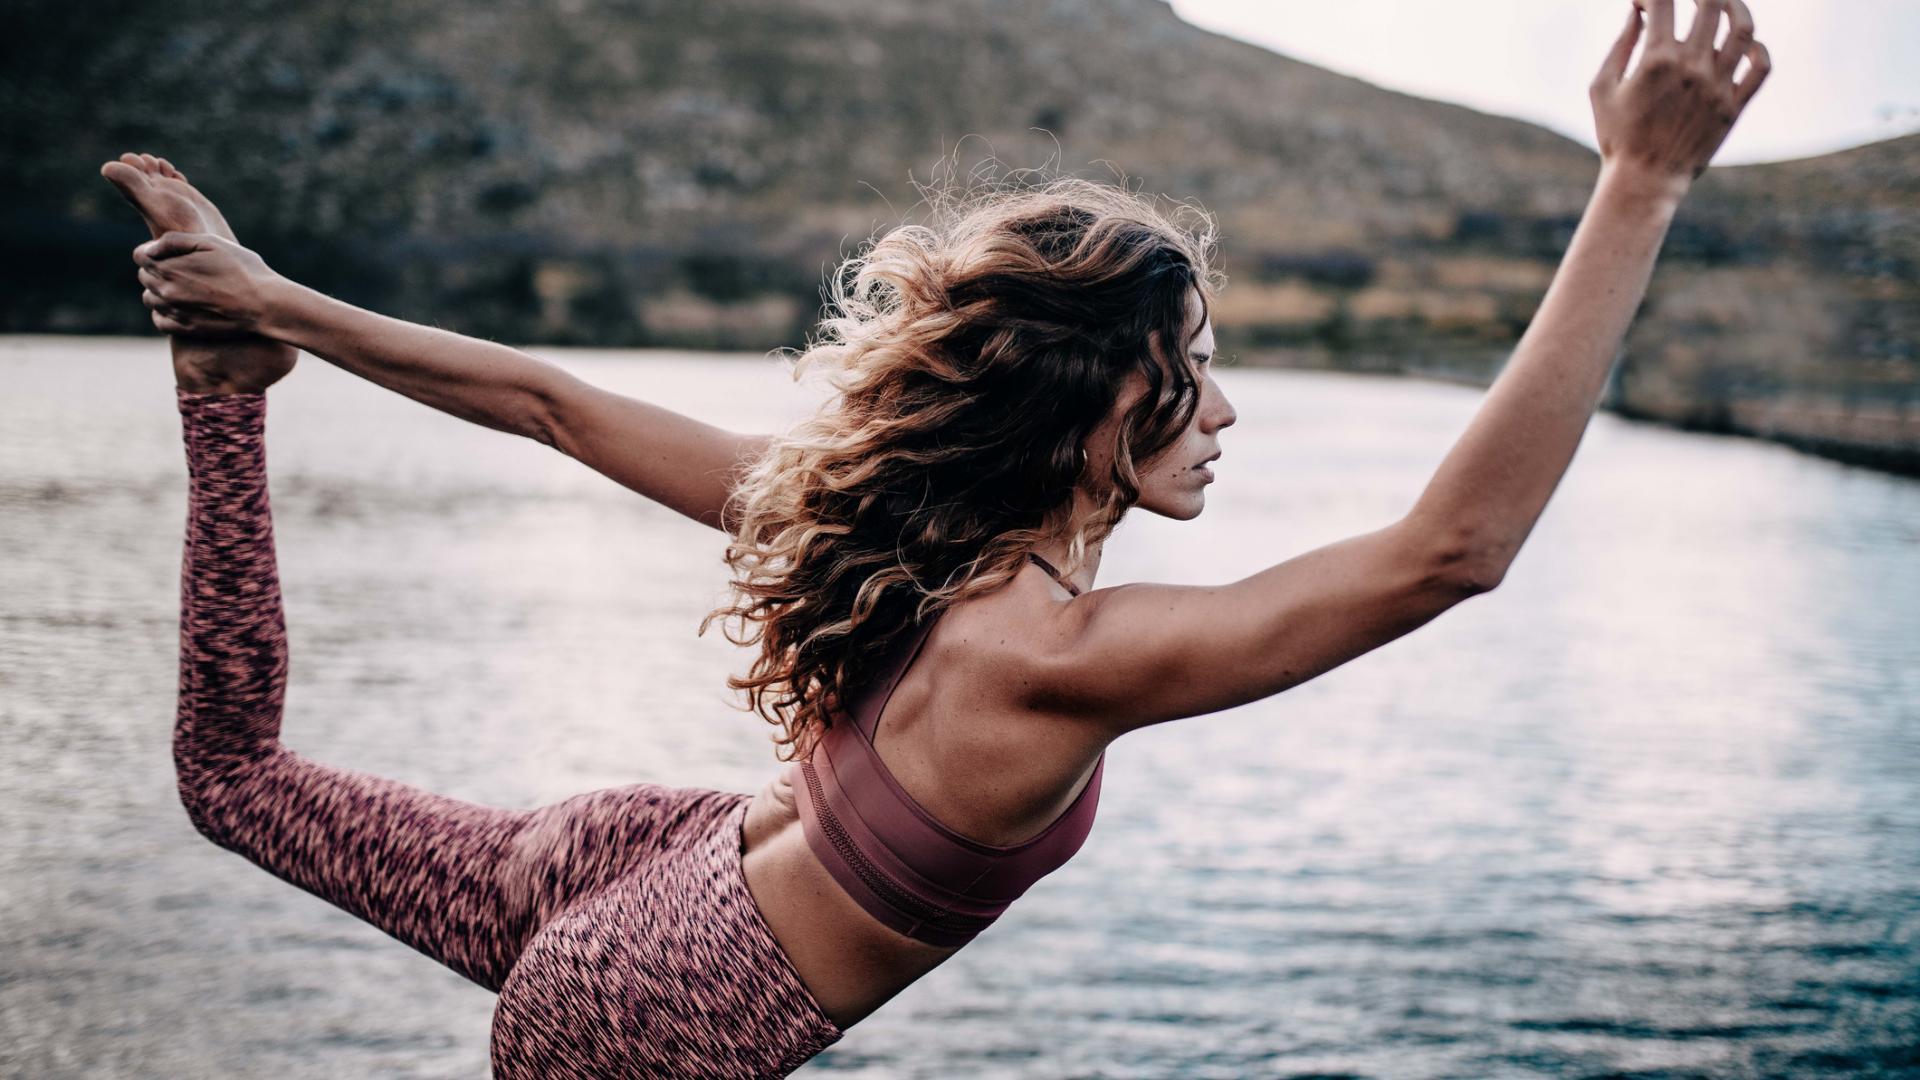 Junge Frau macht Yoga-Pose